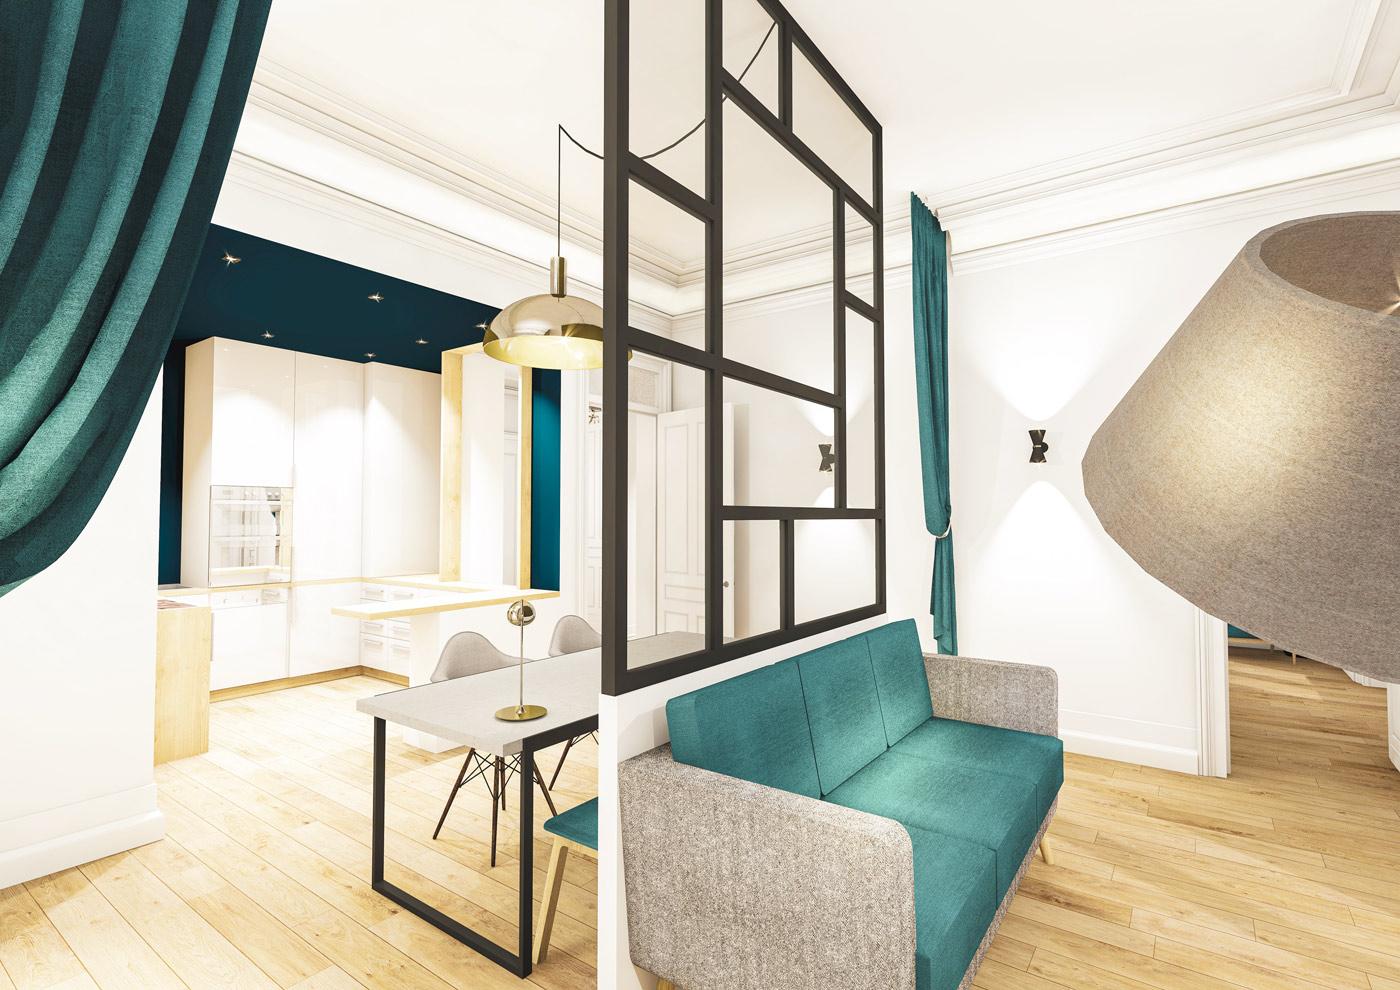 Alaman Macdonald Architecte Appartement Biarritz 2